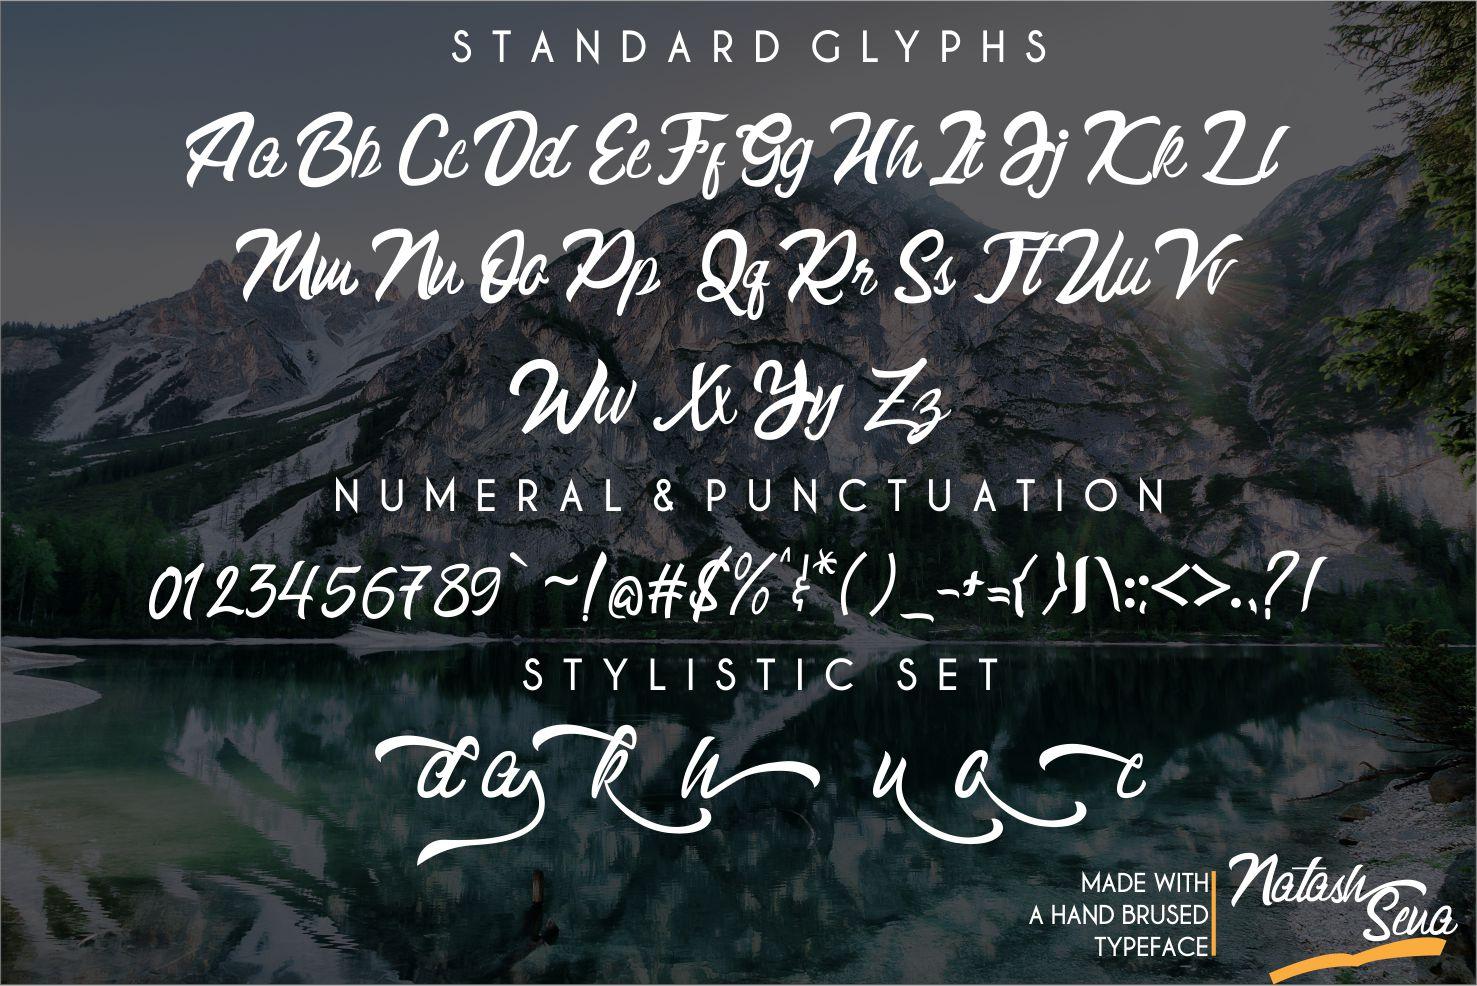 Natash Sena Hendlettering Font example image 7